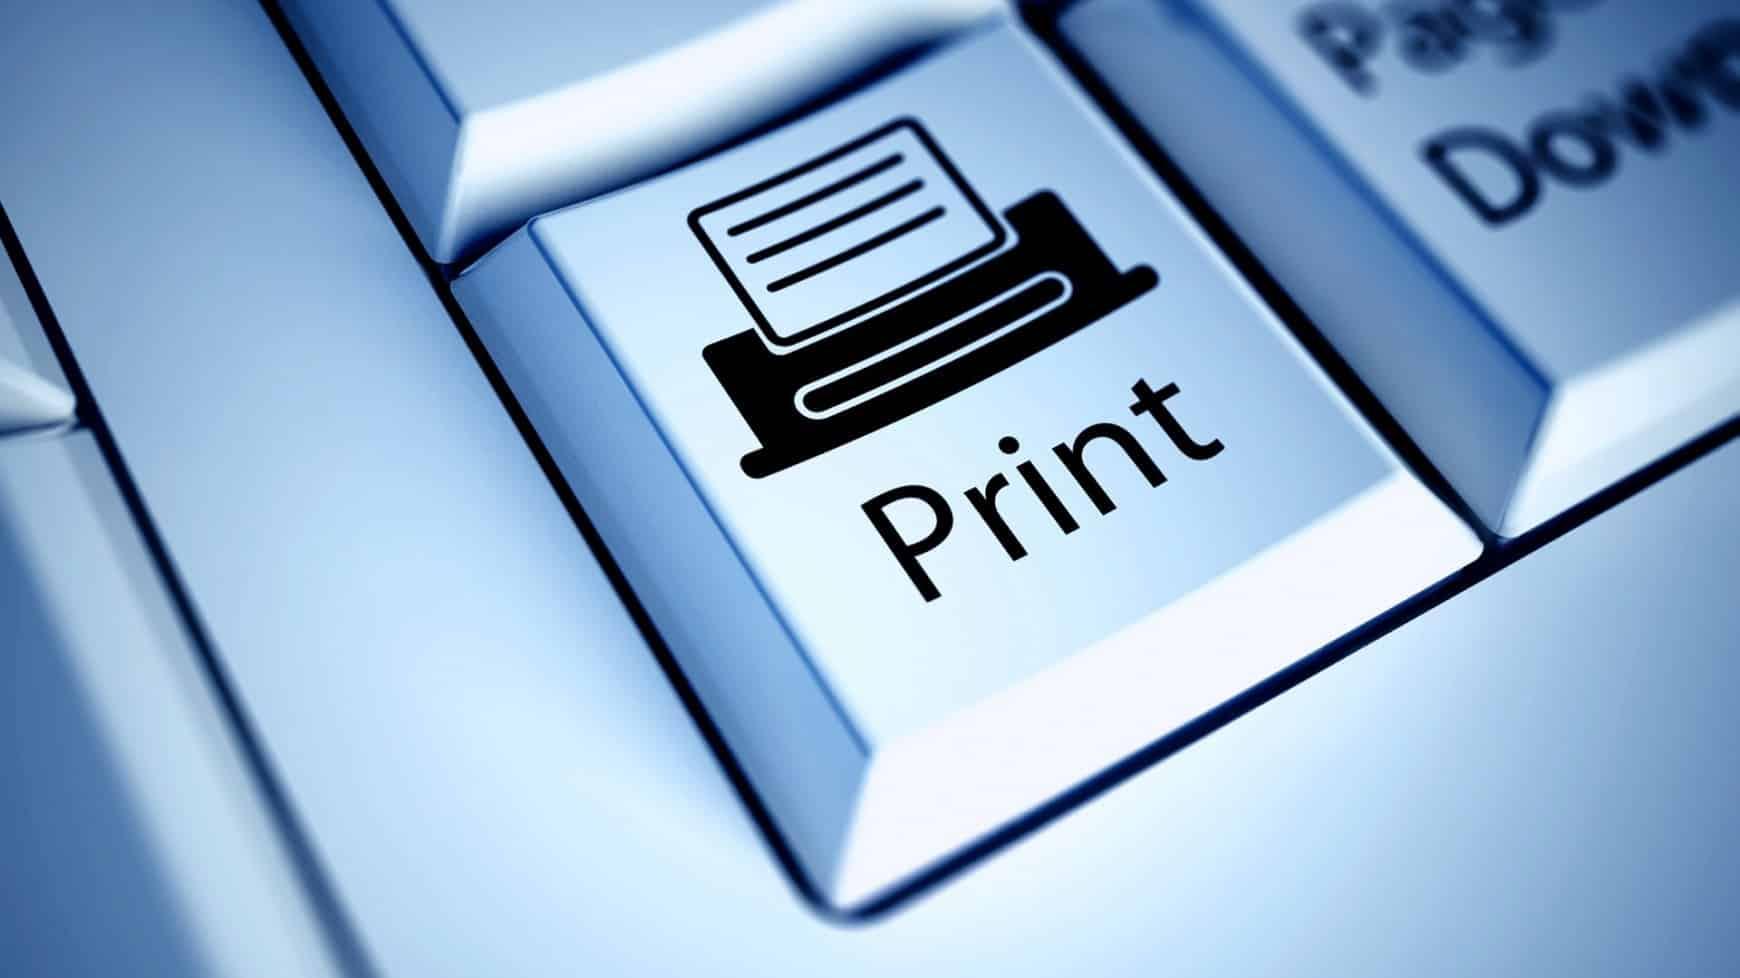 6+ Cara Print Bolak Balik yang Benar